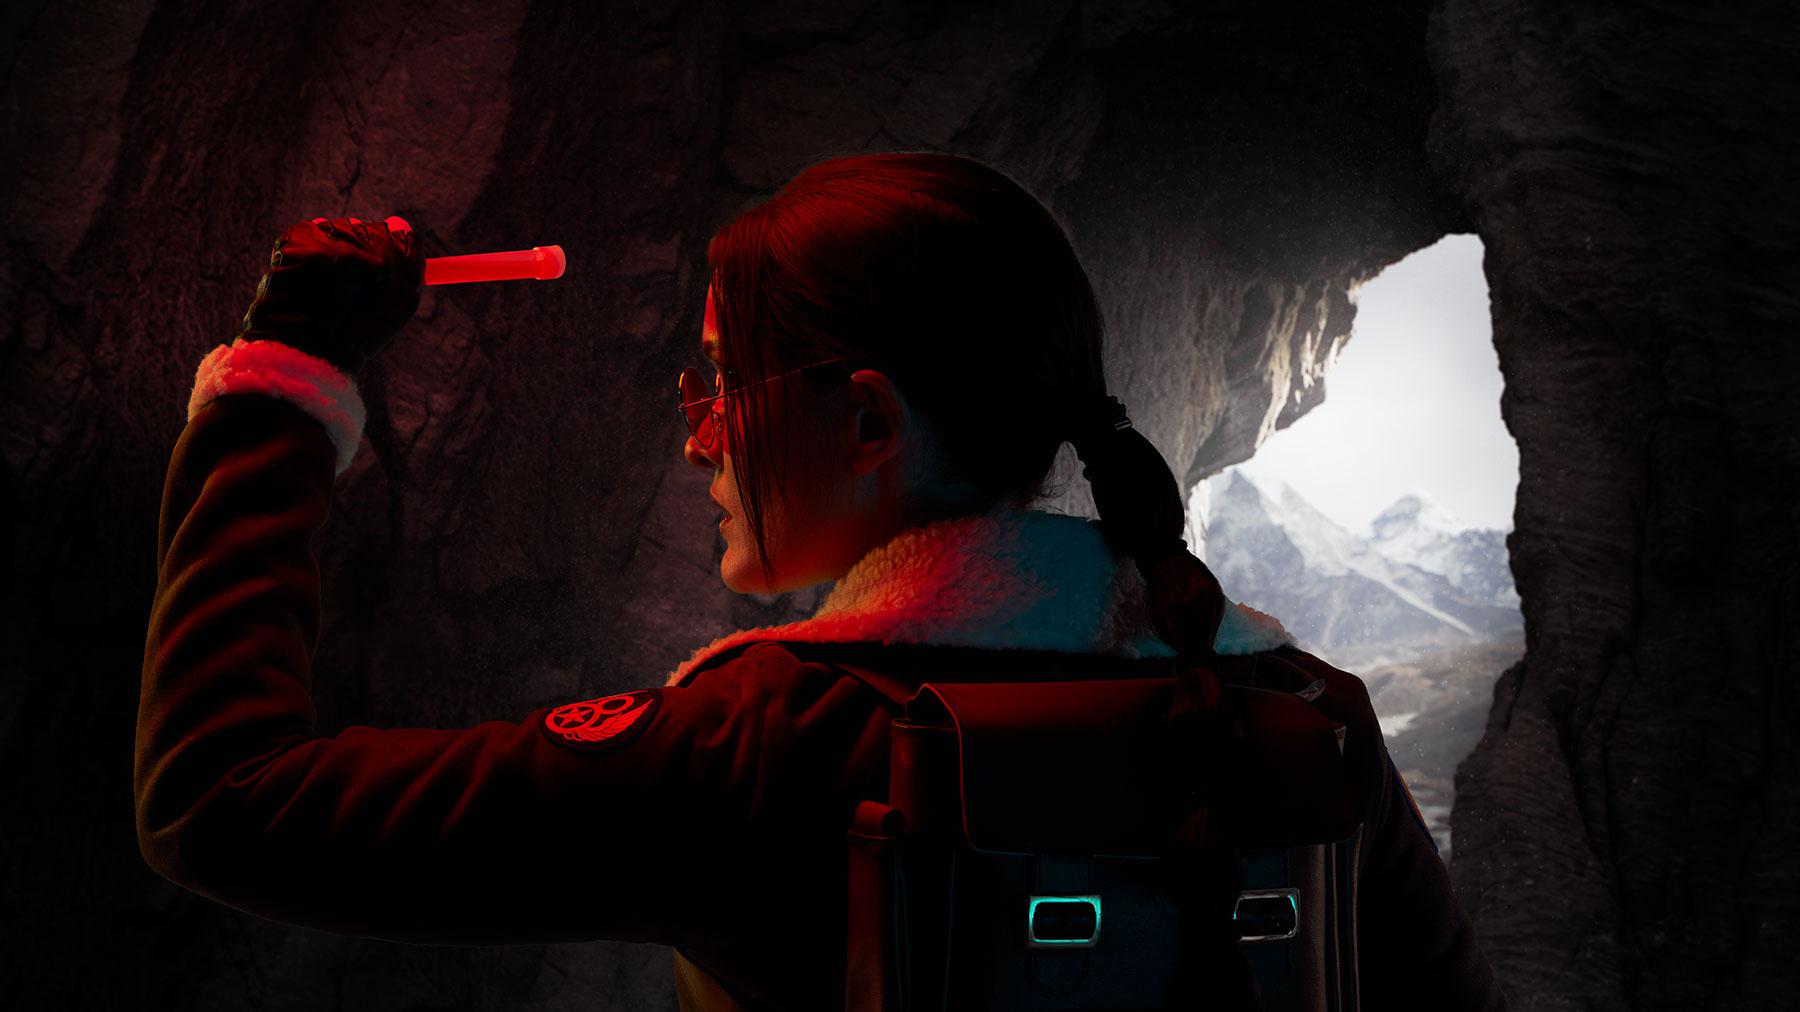 Arthur Sayanoff Tomb Raider 2 04 06